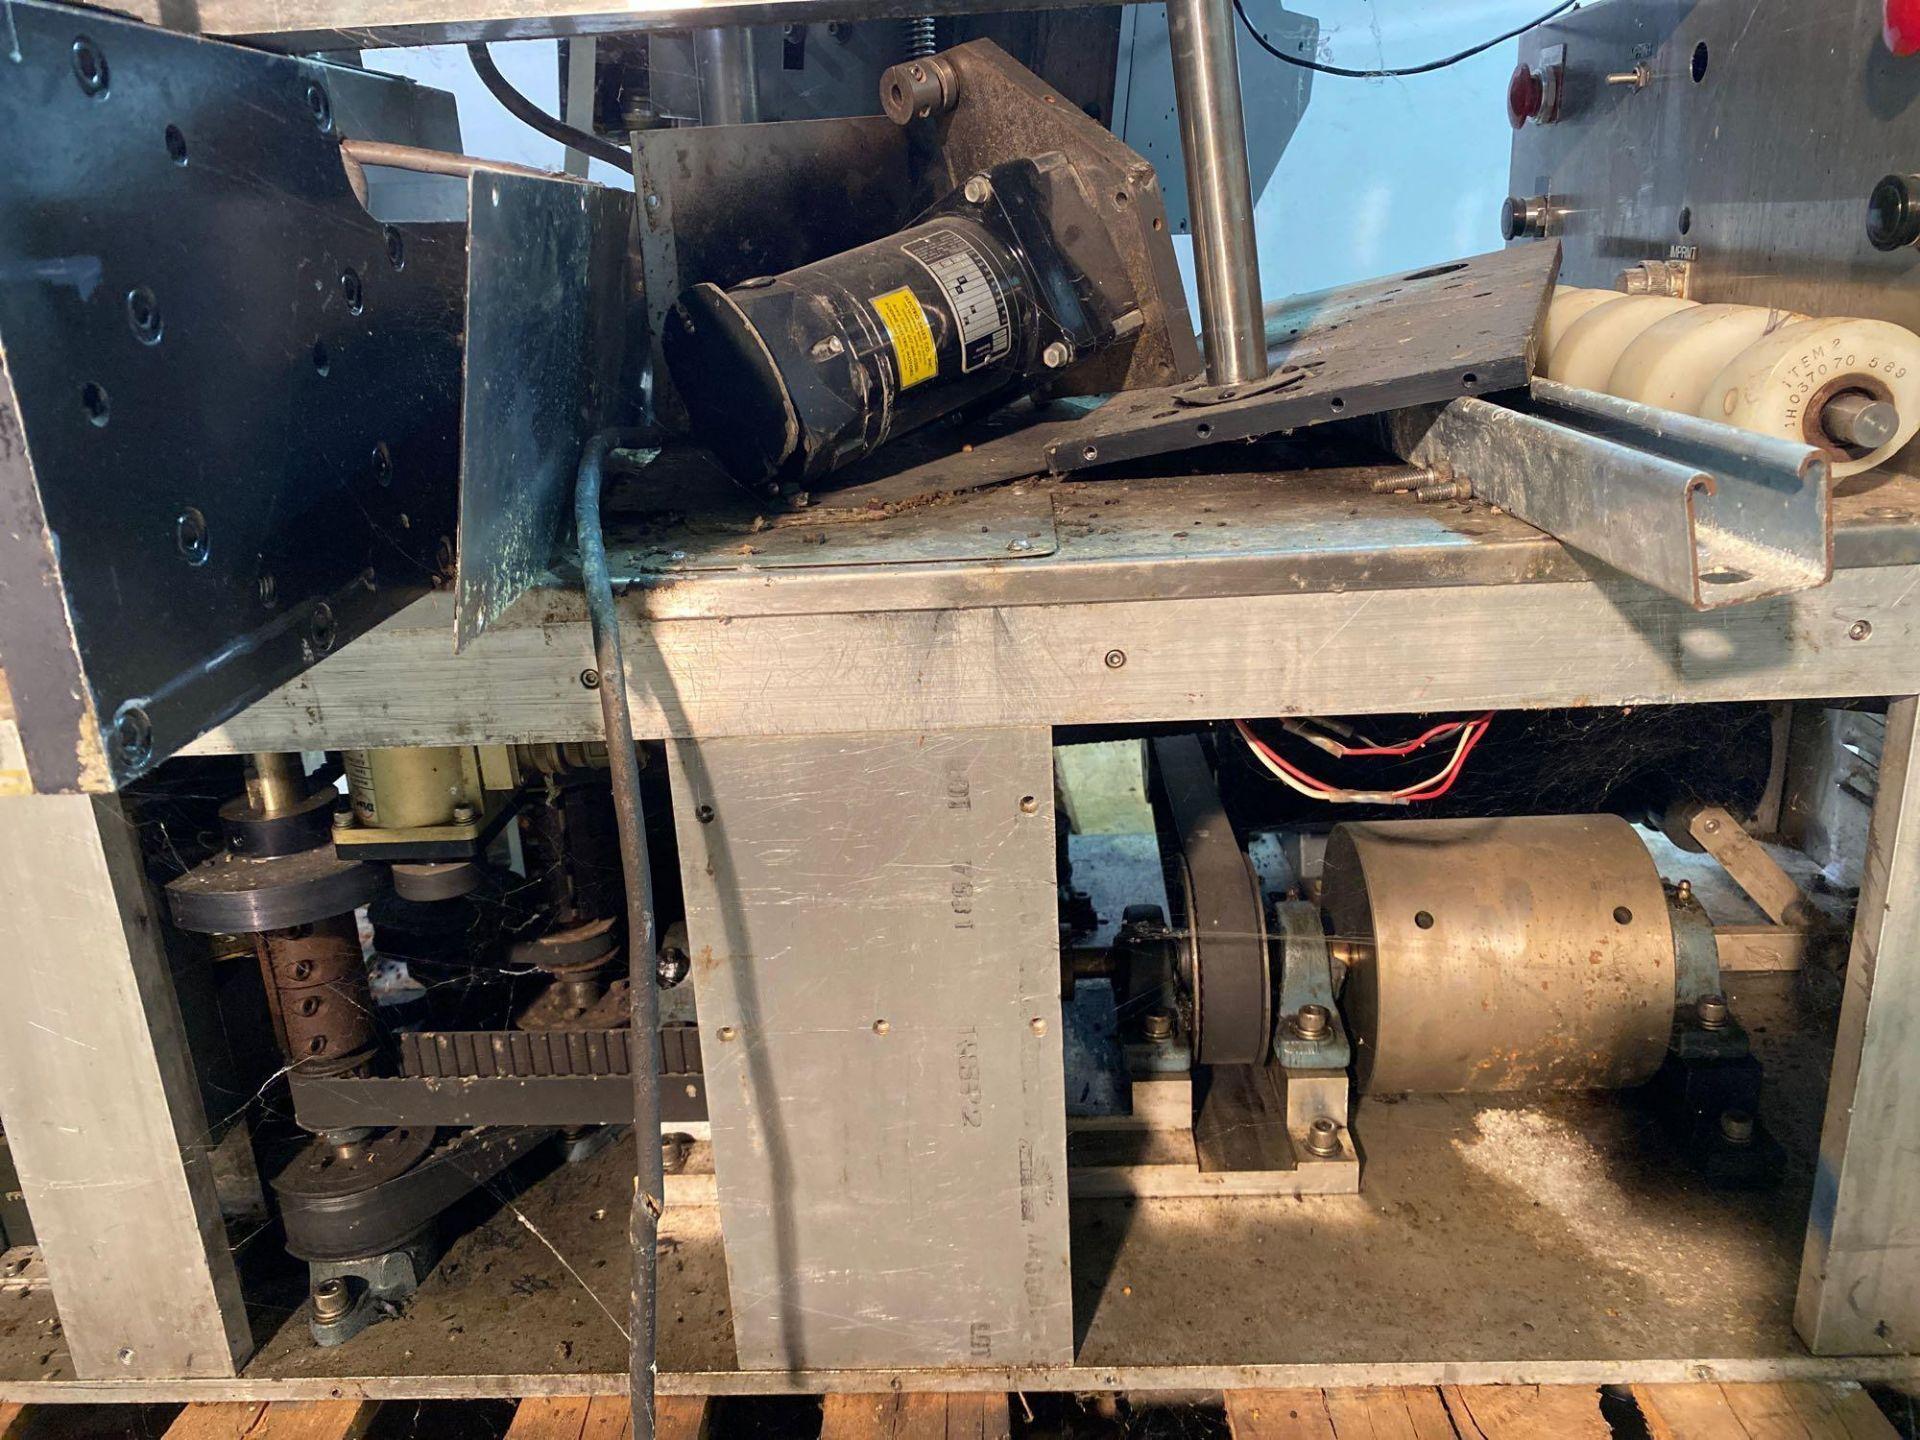 Label-Aire Model 3200 Conveyorized Pressure Sensitive Labeler - Image 12 of 14